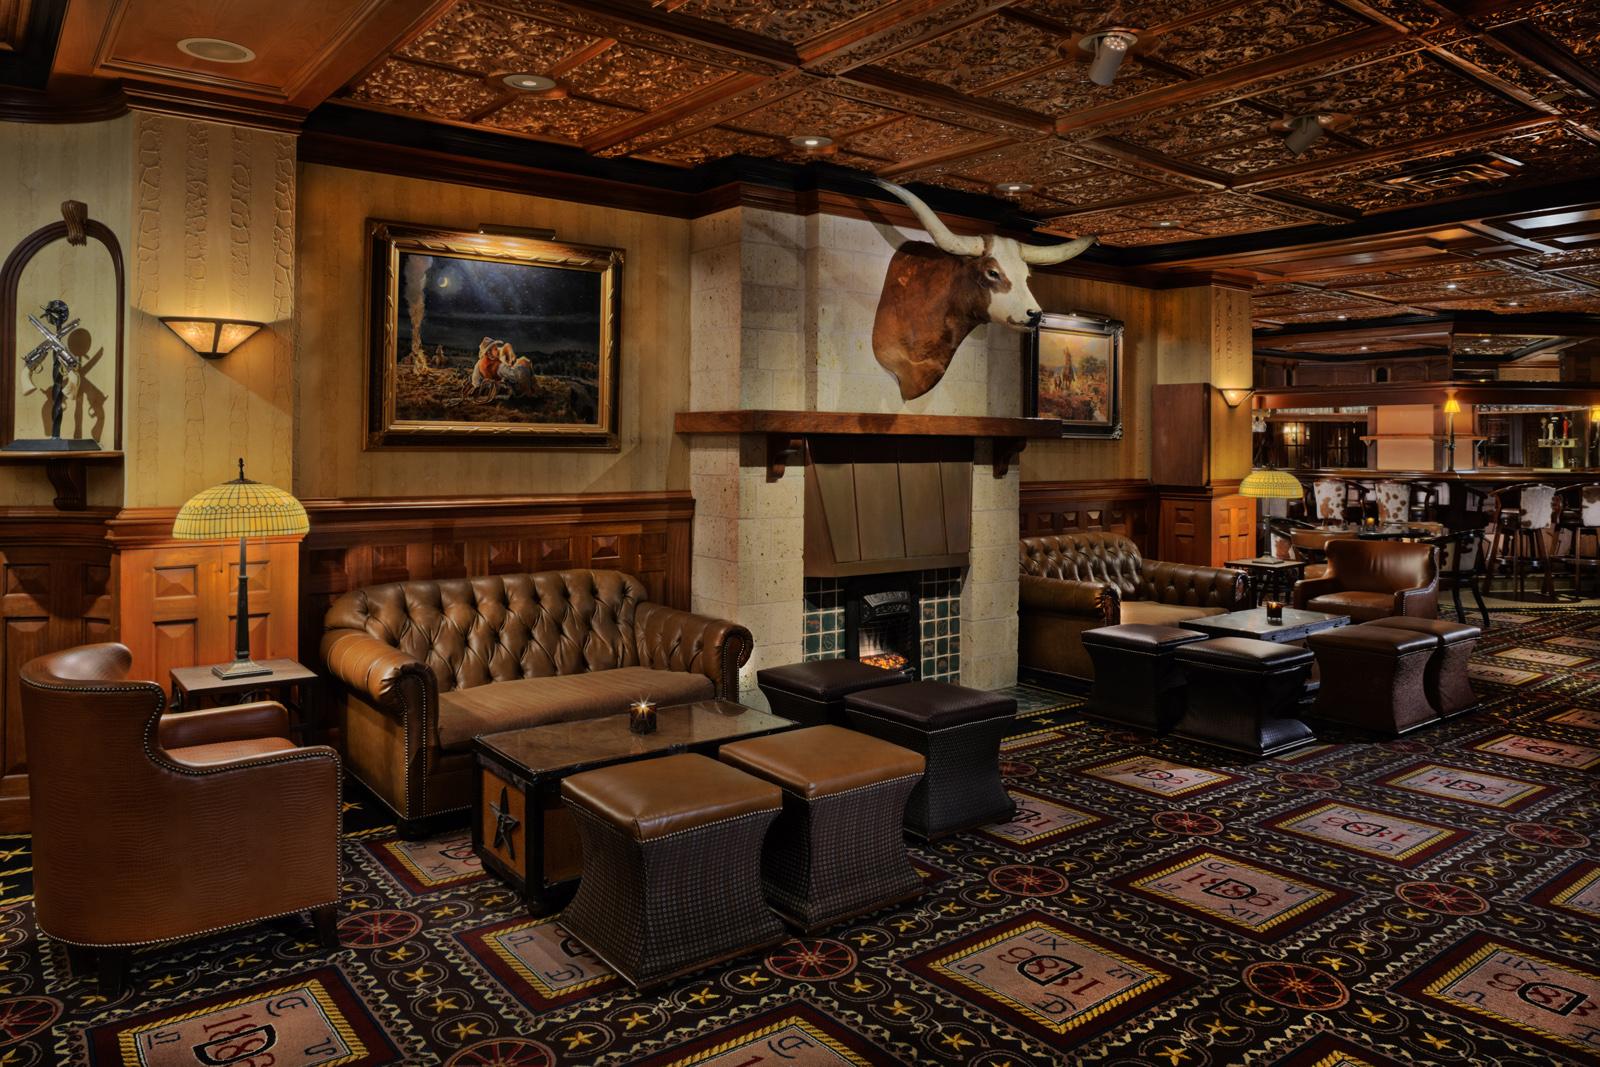 Of course the Driskill bar has a Texas longhorn. Photo courtesy of Driskill hotel